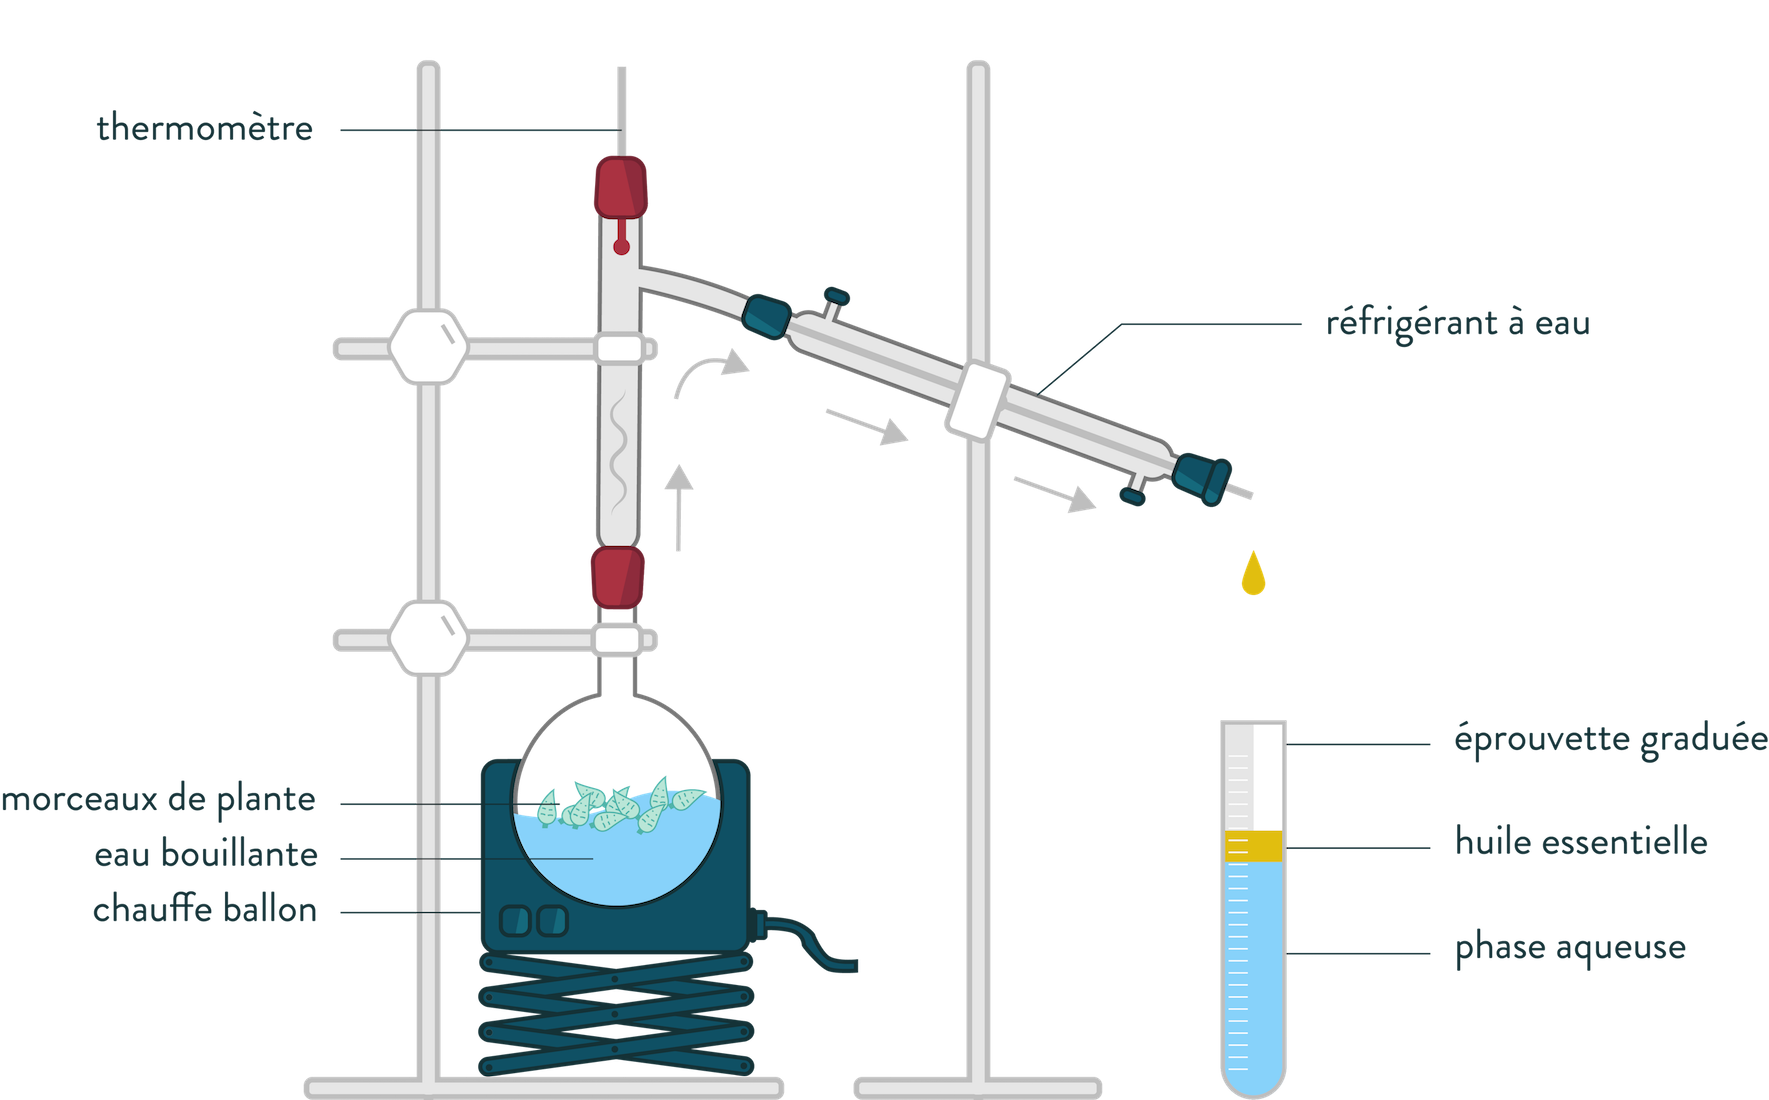 hydrodistillation